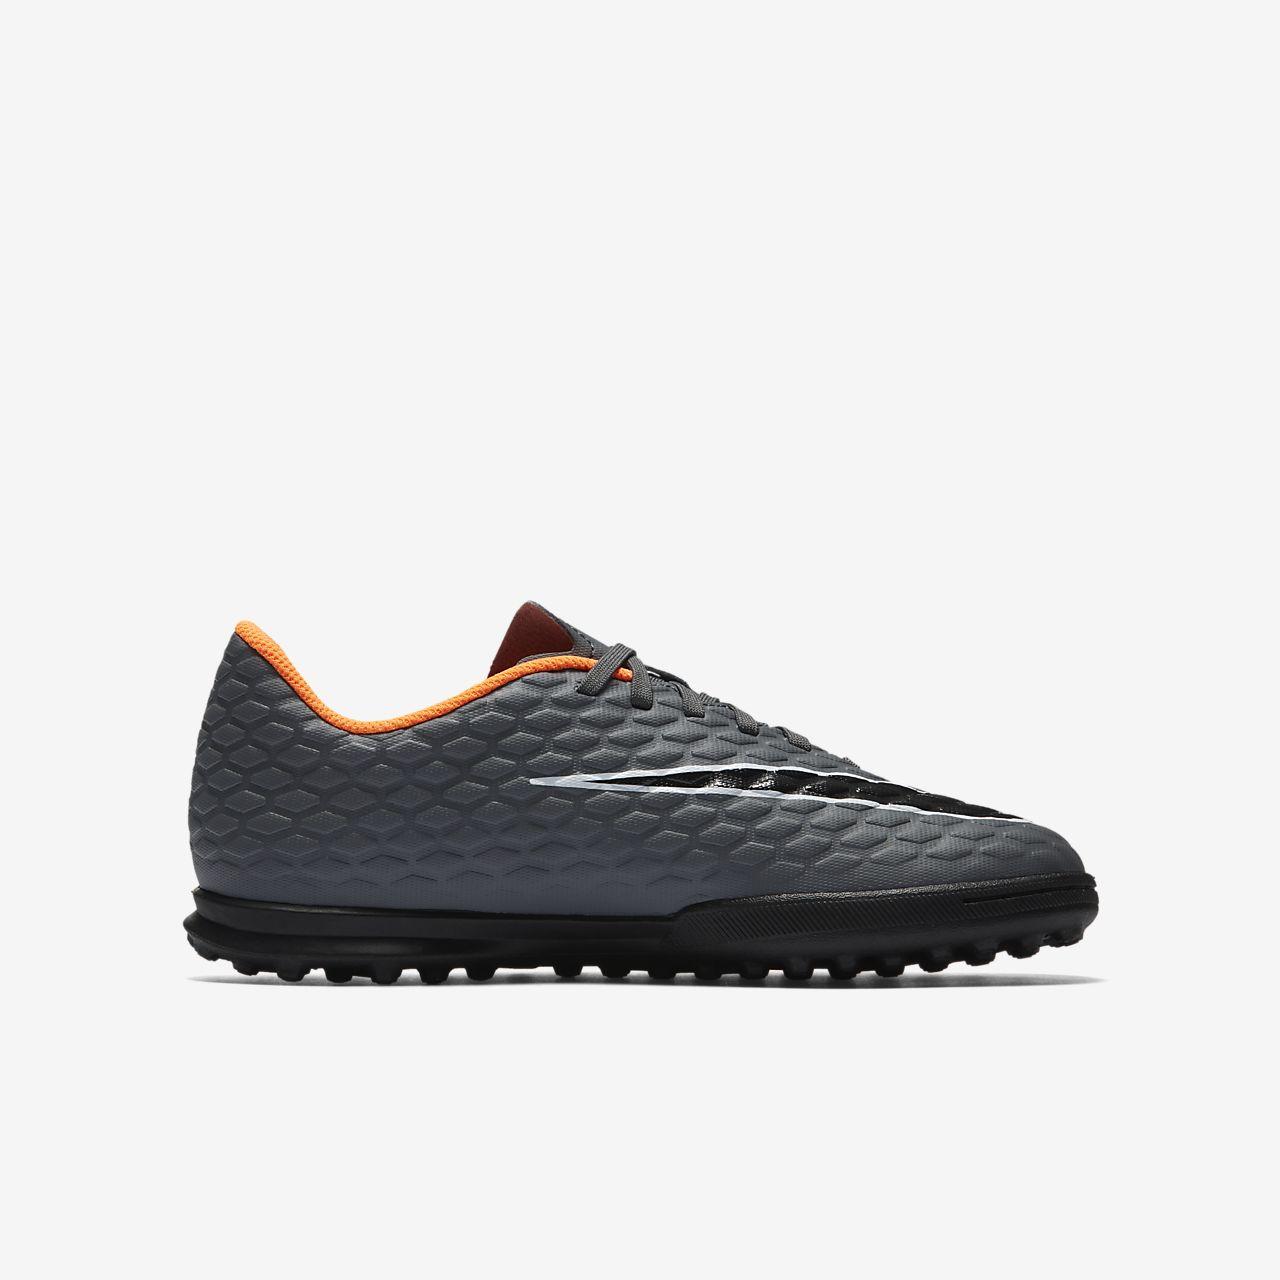 premium selection 808ef 5bf00 Nike Hypervenom PhantomX 3 Club Turf Junior - Dark Grey/Orange